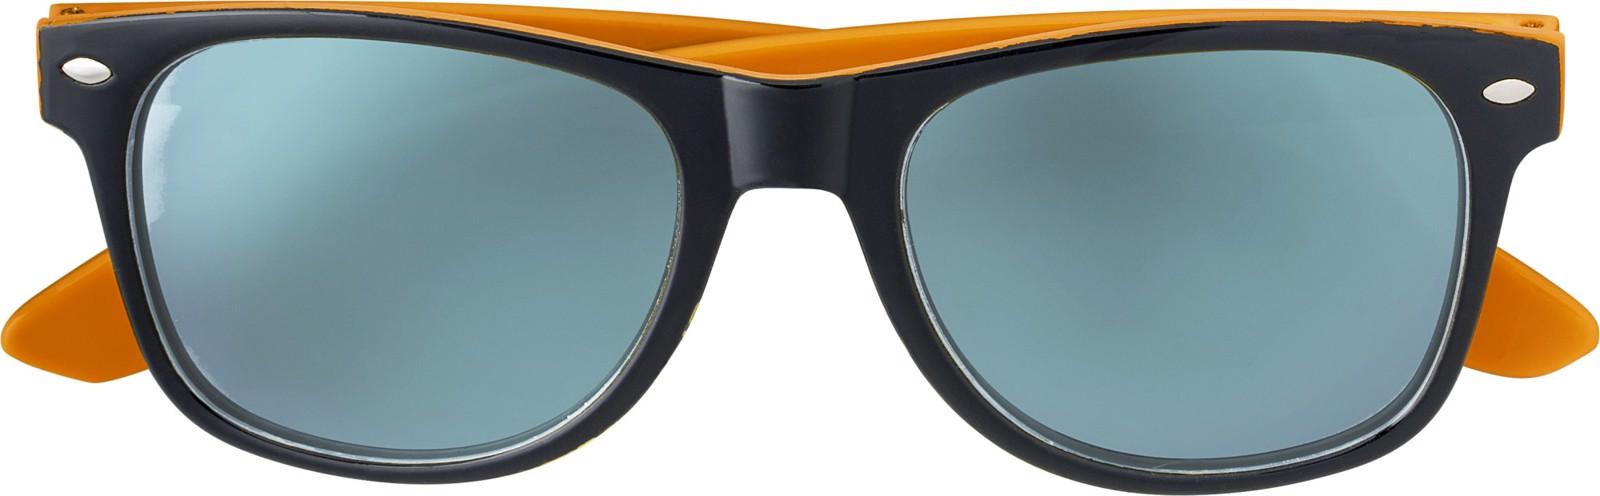 Acrylic sunglasses - Orange